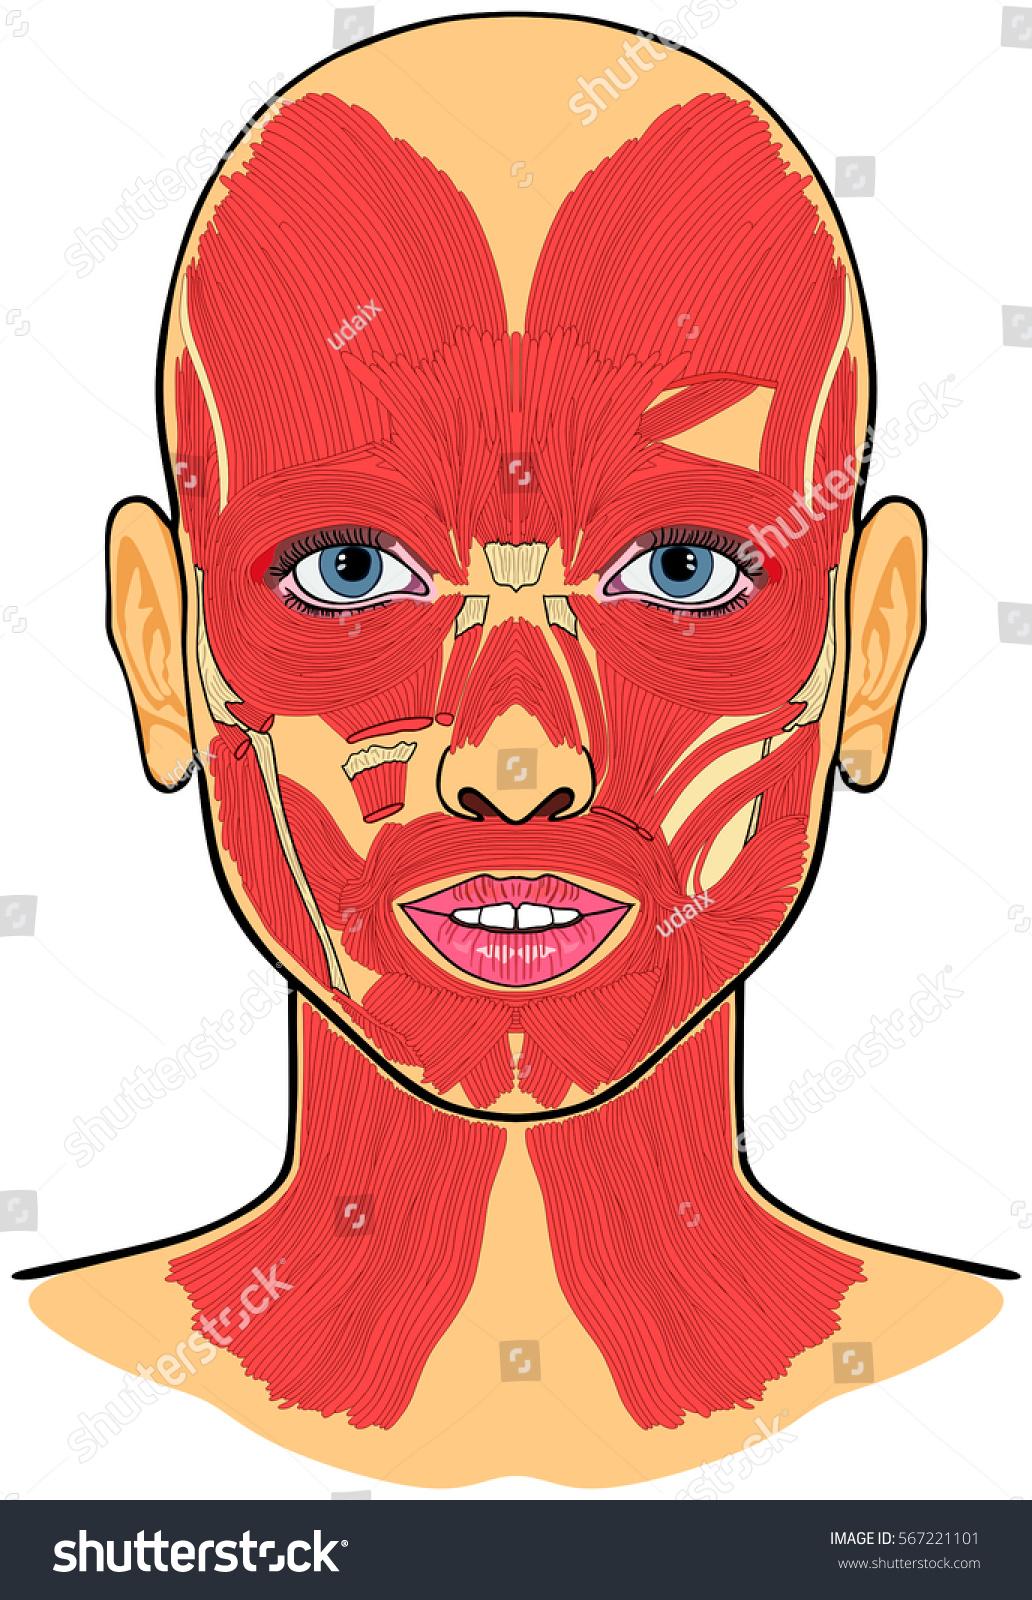 Human Face Muscles Anatomy Vector Stock Vector 567221101 - Shutterstock